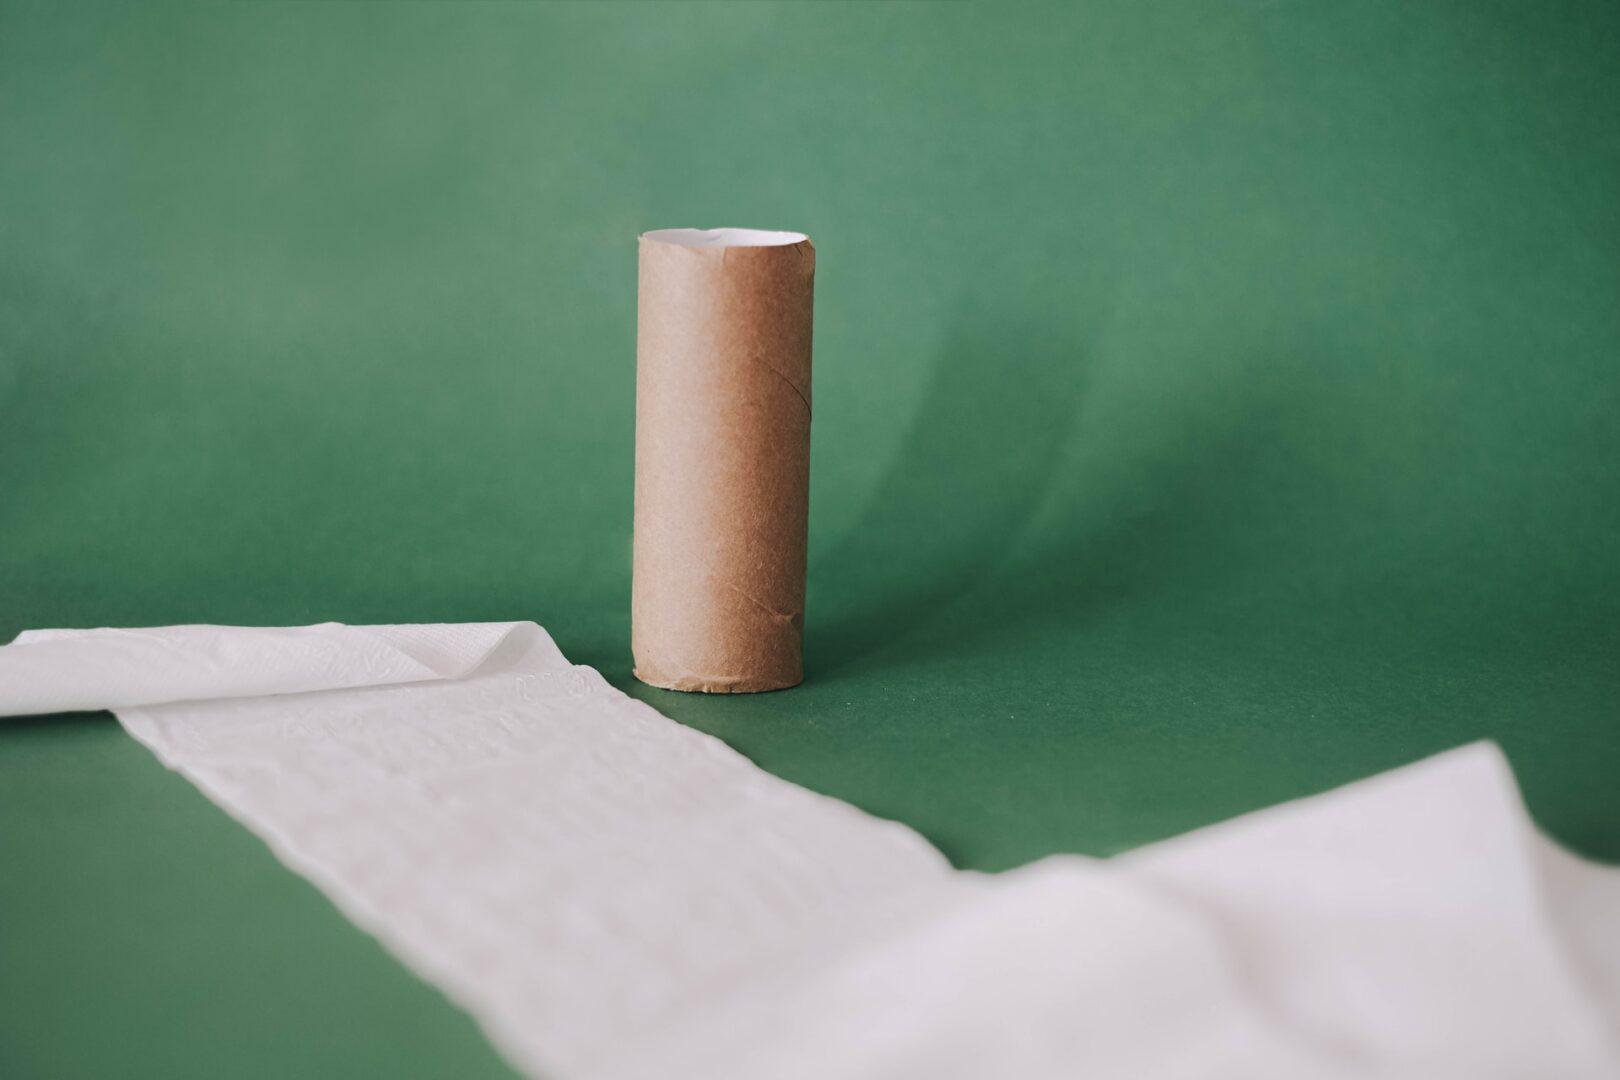 Toilet Paper Roll Challenge